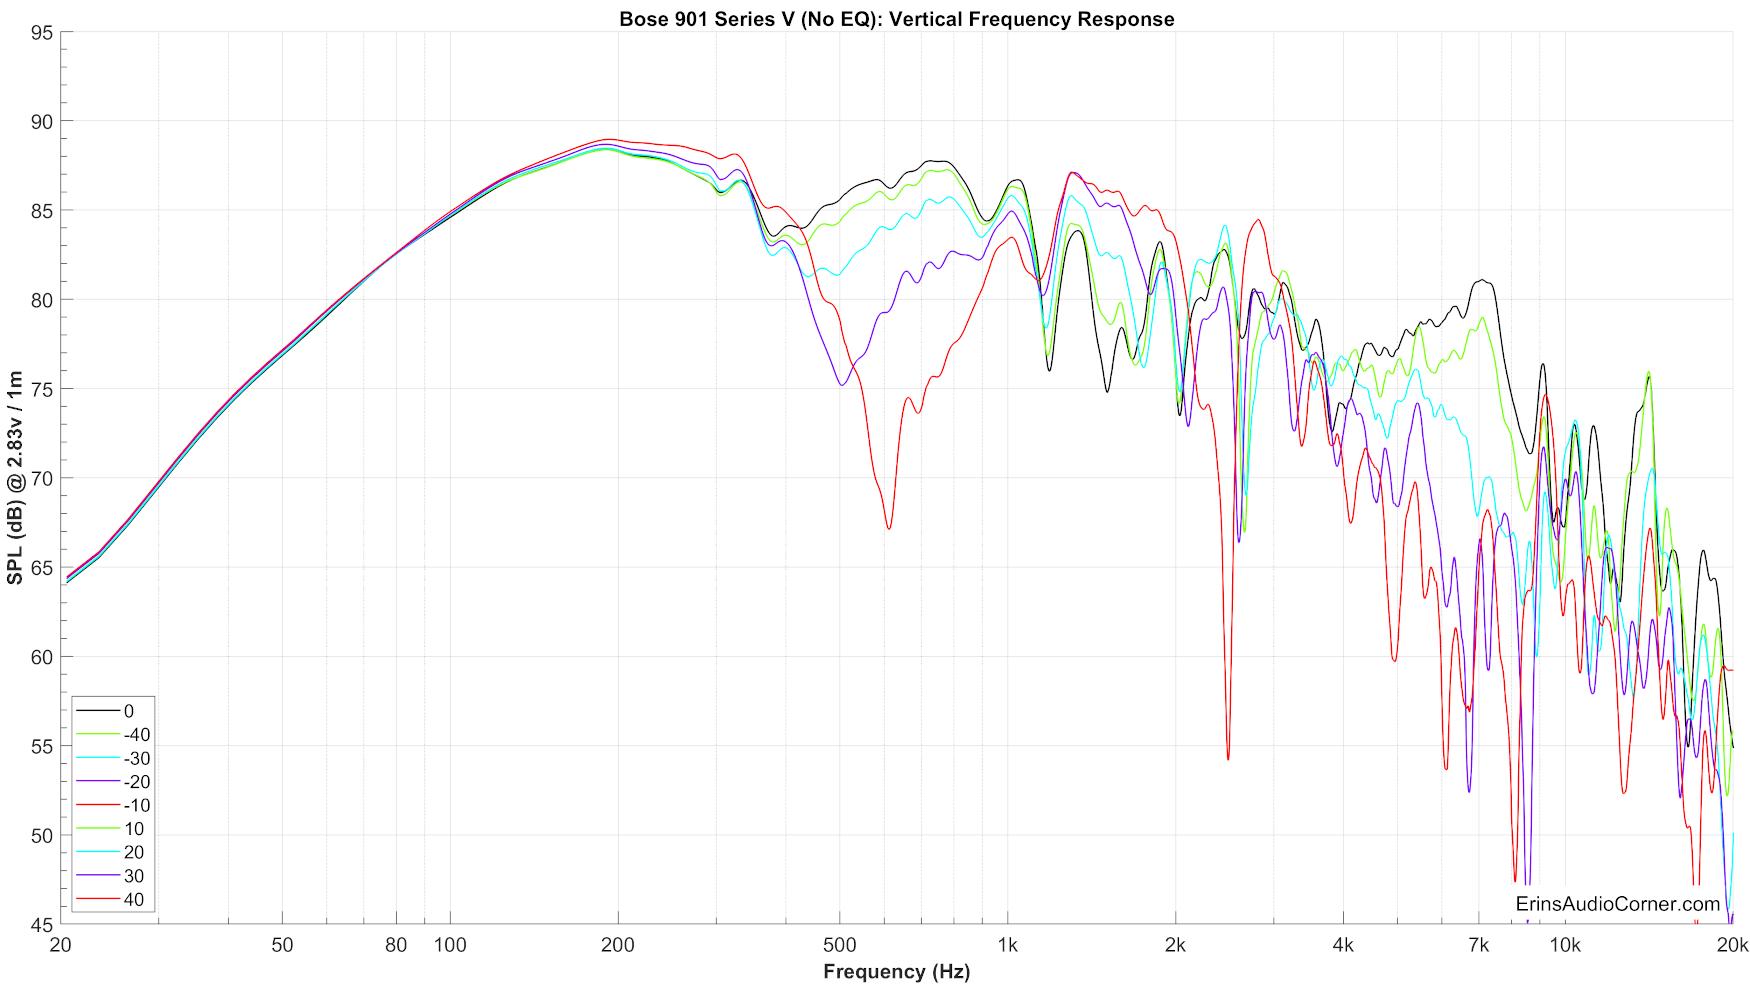 Bose%20901%20Series%20V%20(No%20EQ)%20Vertical%20FR.png